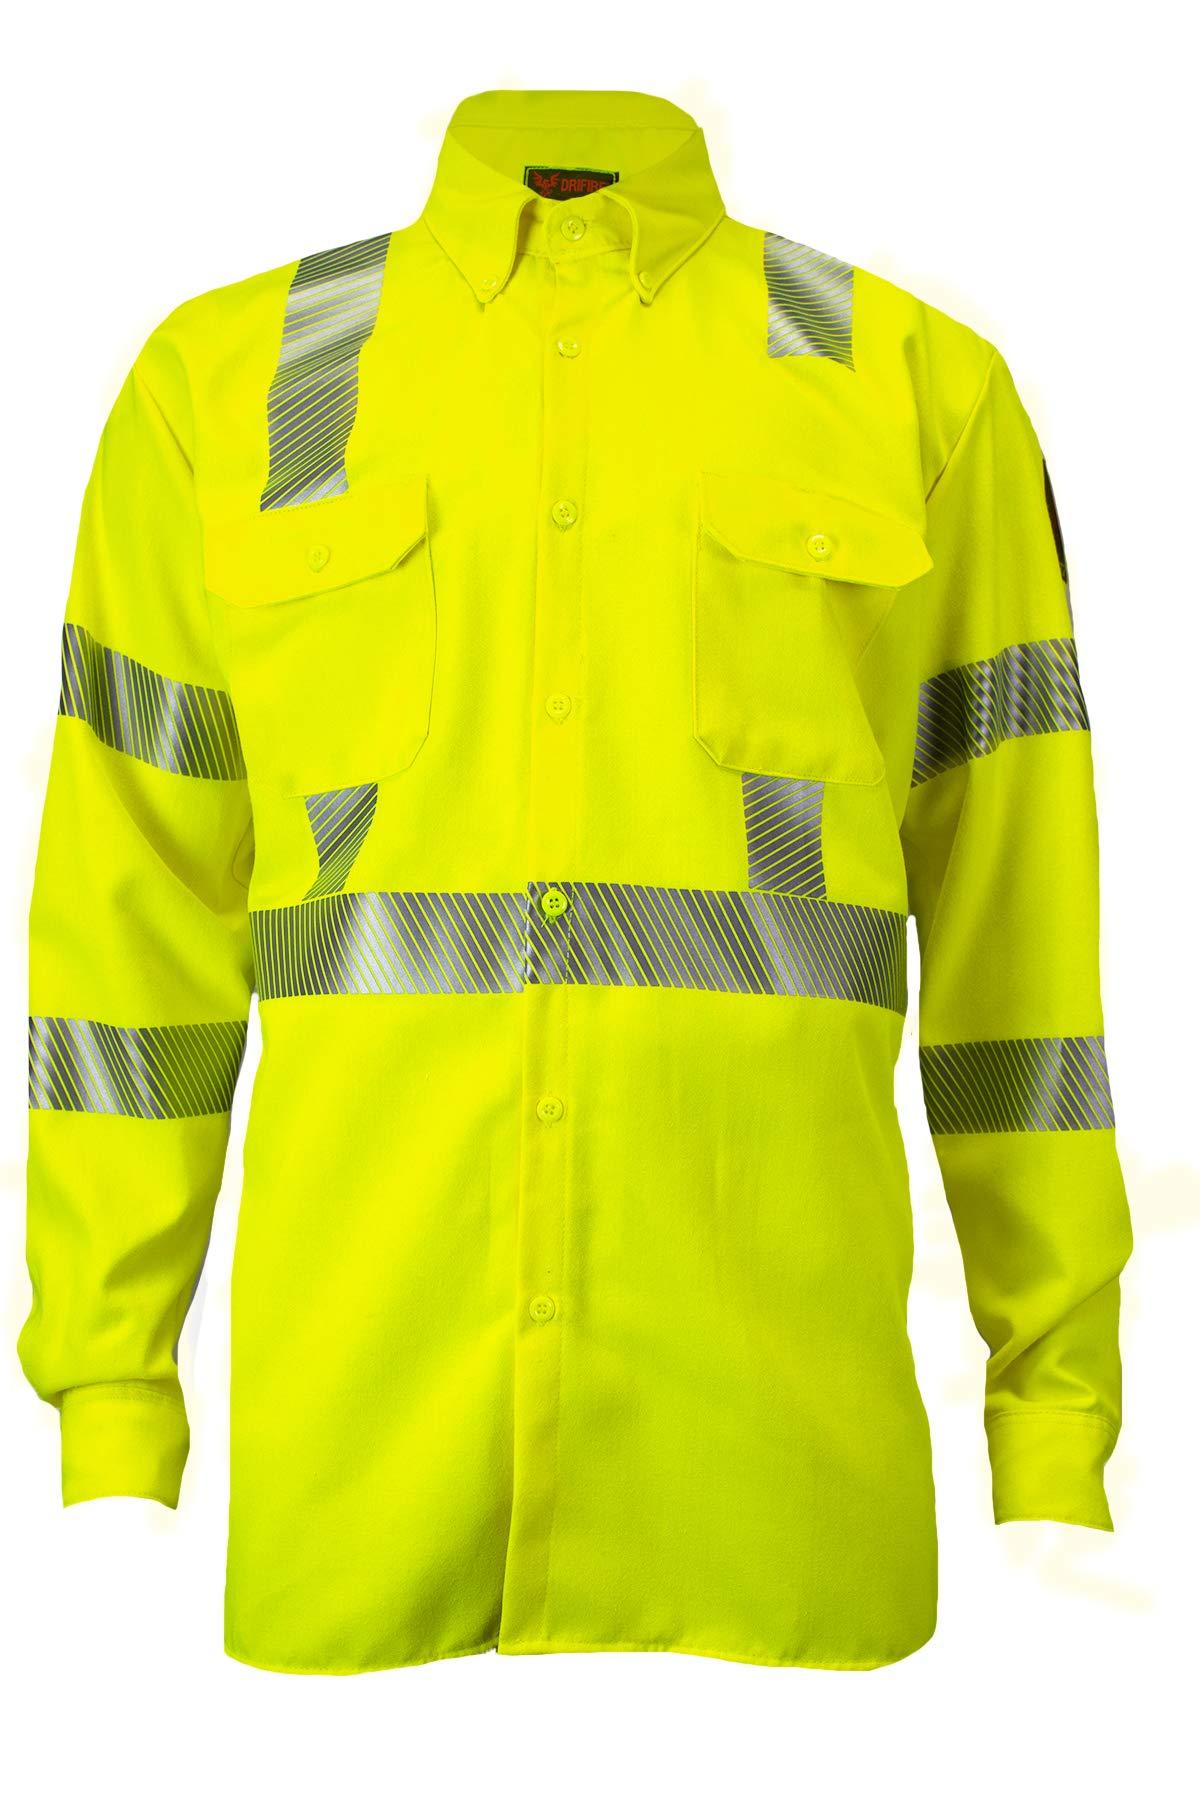 DRIFIRE High Performance FR Flame Resistant Hi-Vis Utility Shirt Electrical Industrial 7 oz. Lightweight CAT2